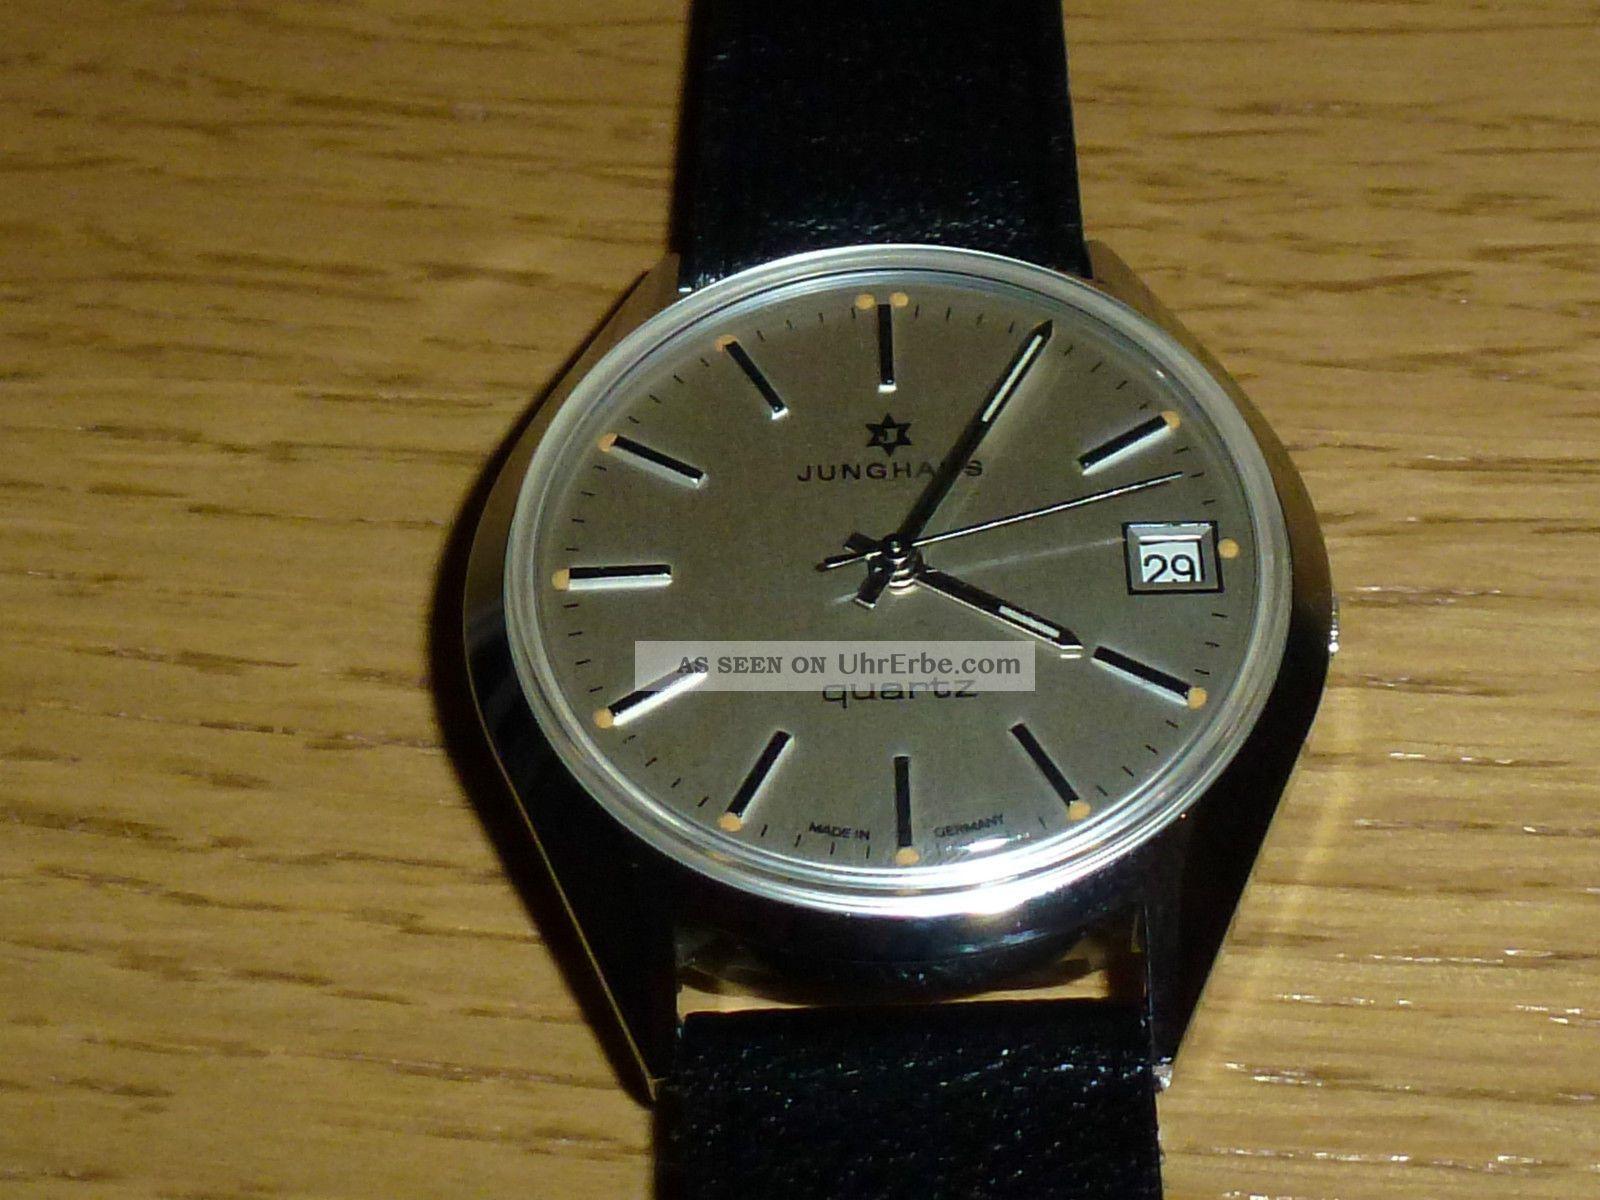 Junghans Quartz Herren Armbanduhr Analog Armbanduhren Bild